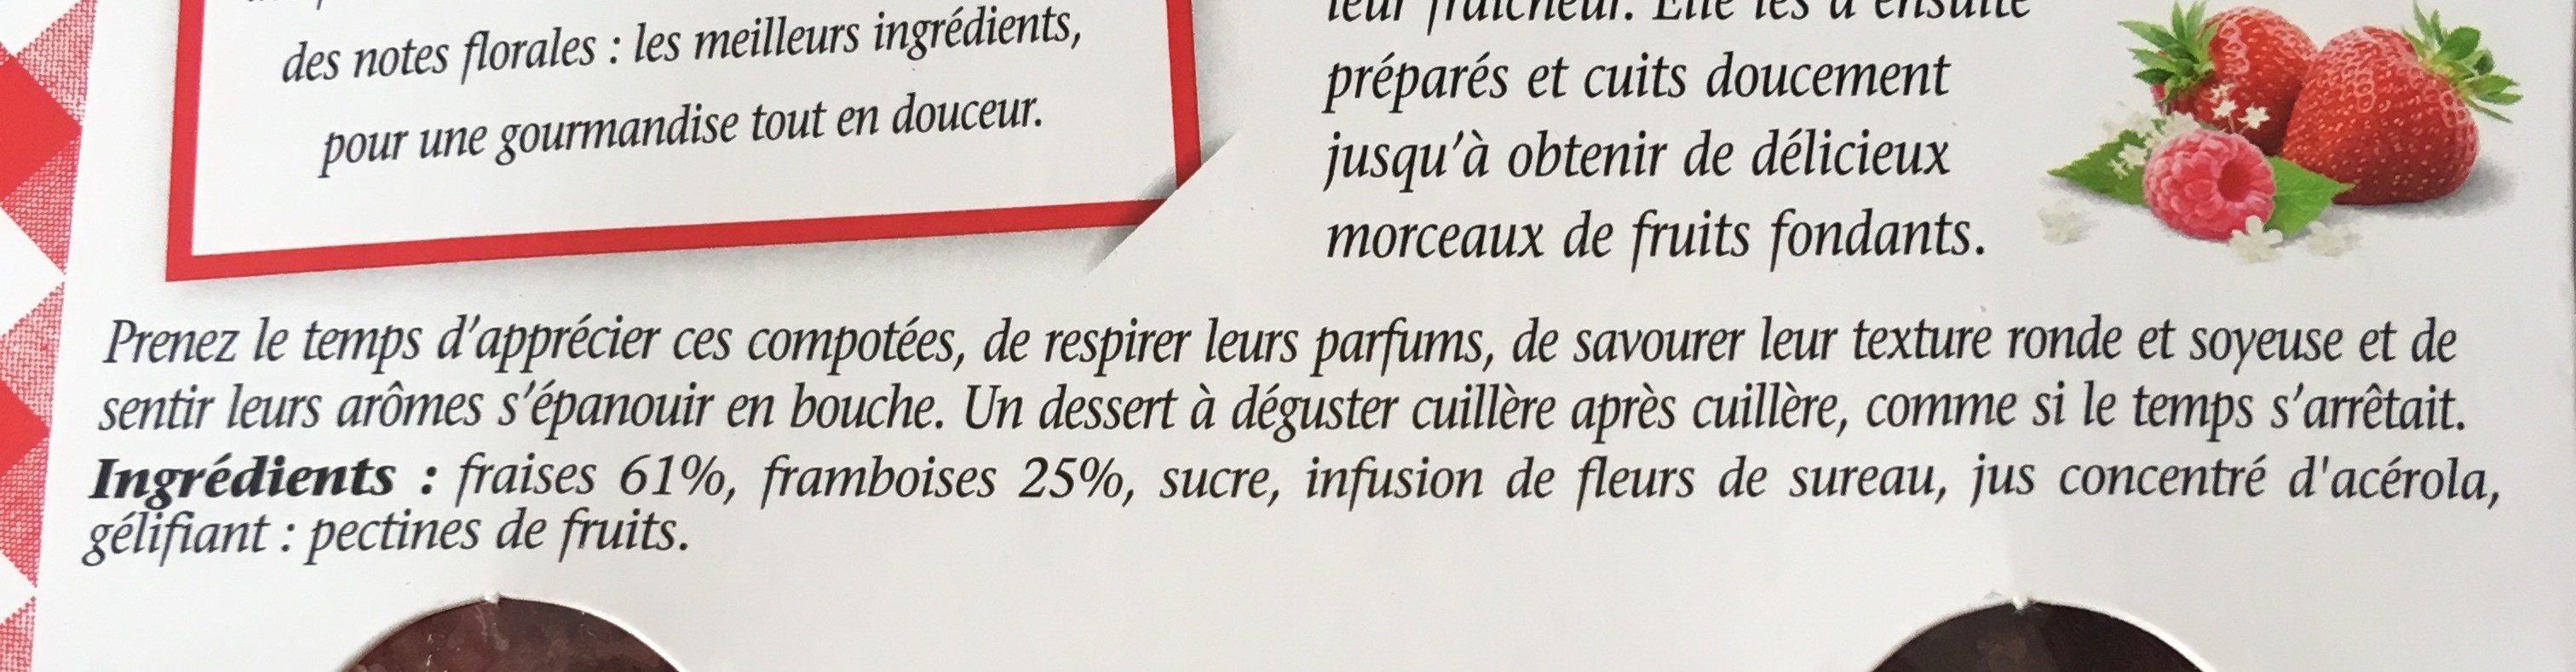 Compotée fraises🍓& framboises - Ingredienti - fr